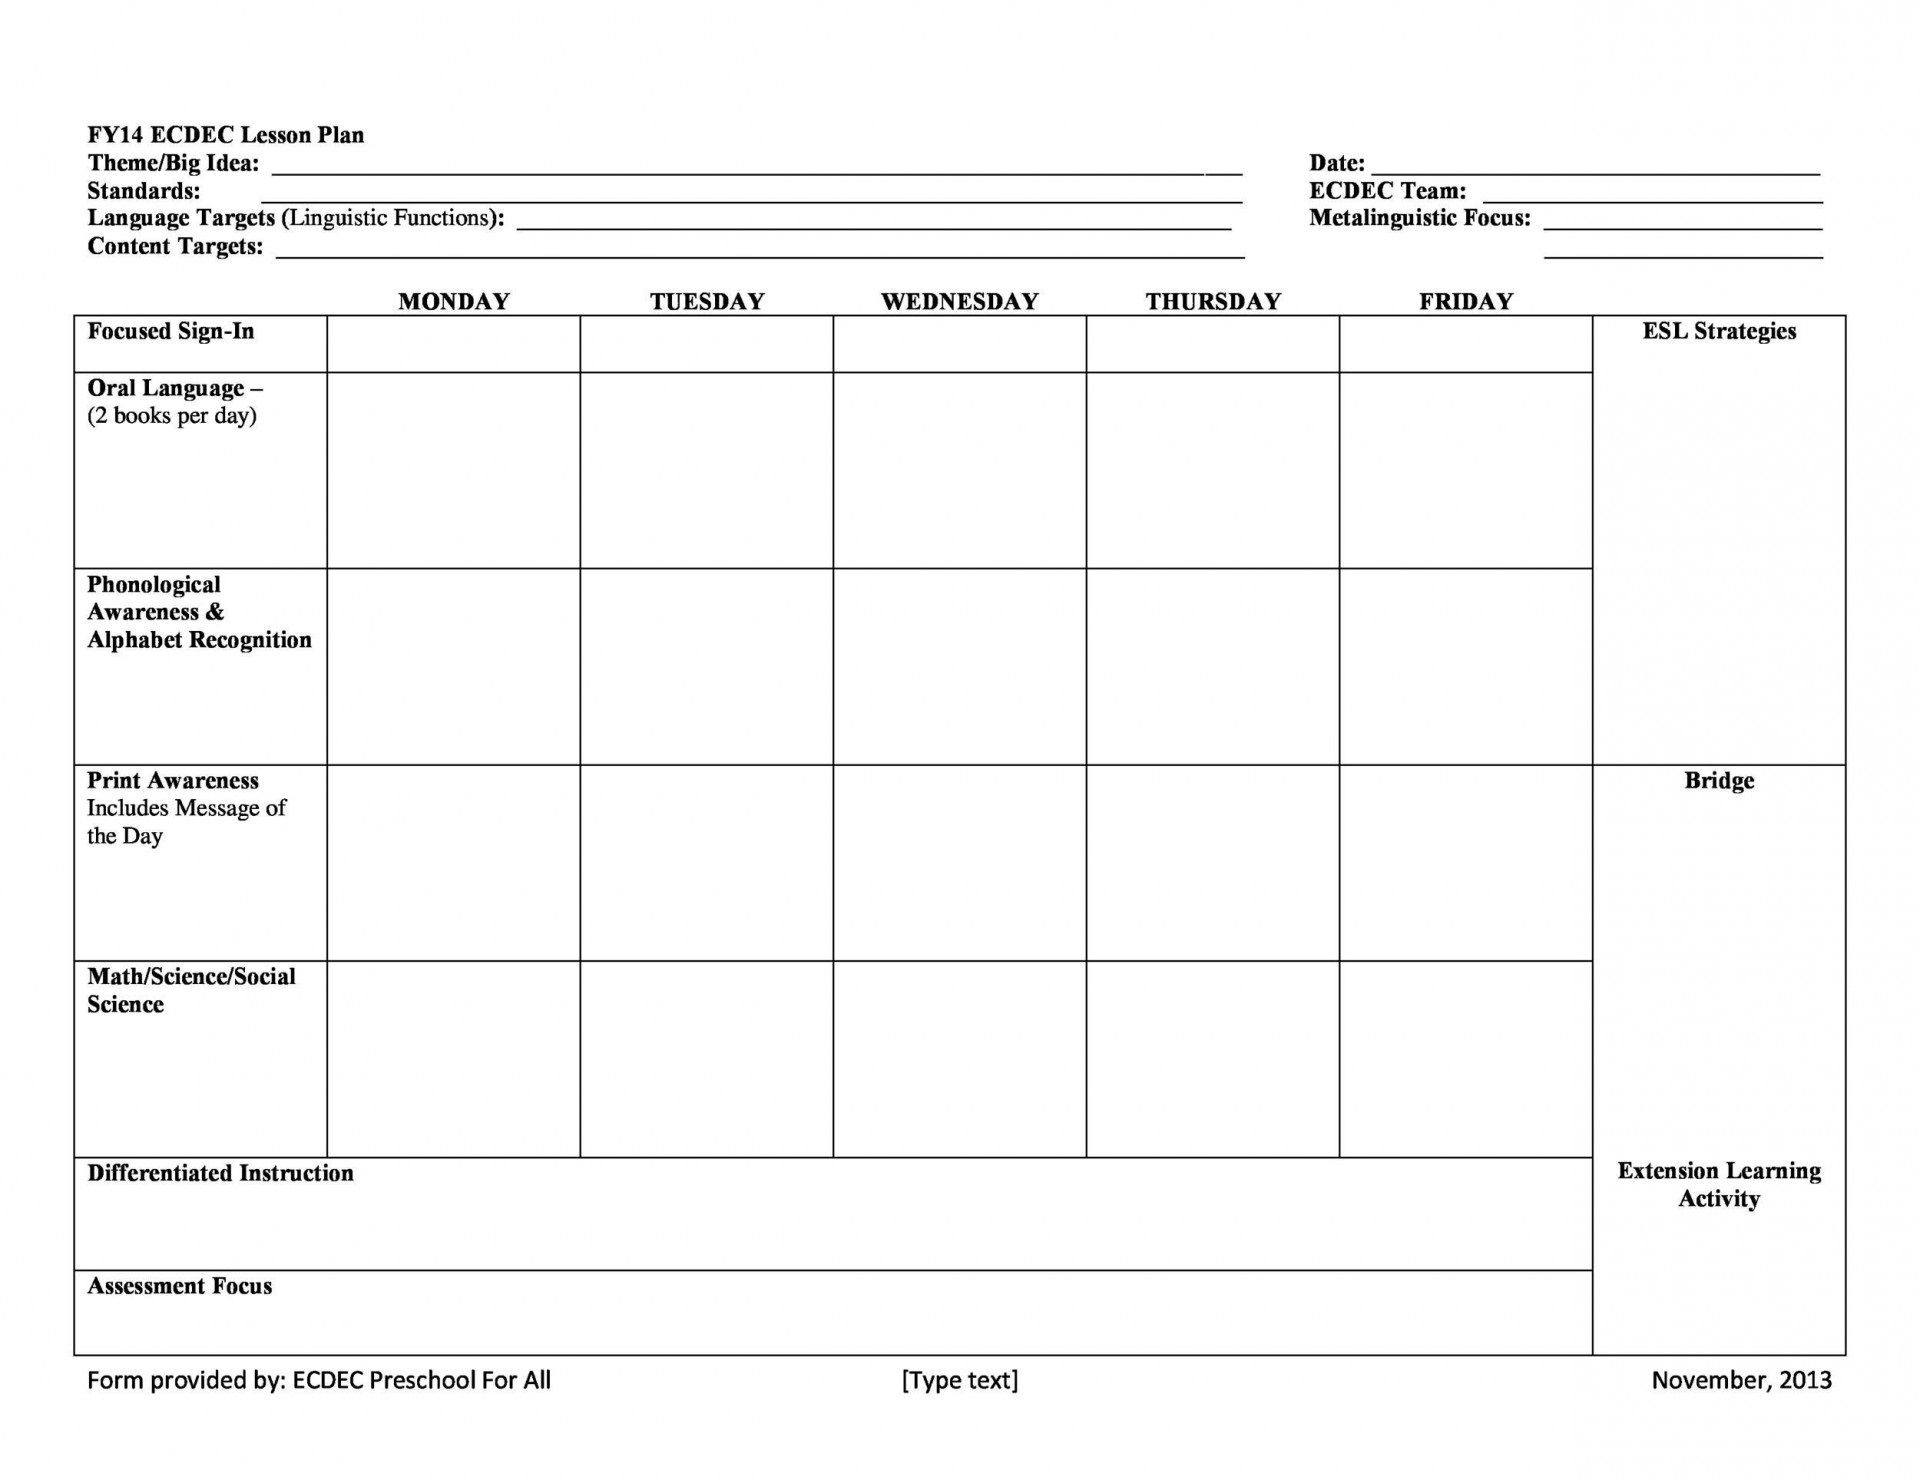 006 Surprising Weekly Lesson Plan Template Editable High Def  Google Doc Preschool Downloadable FreeFull